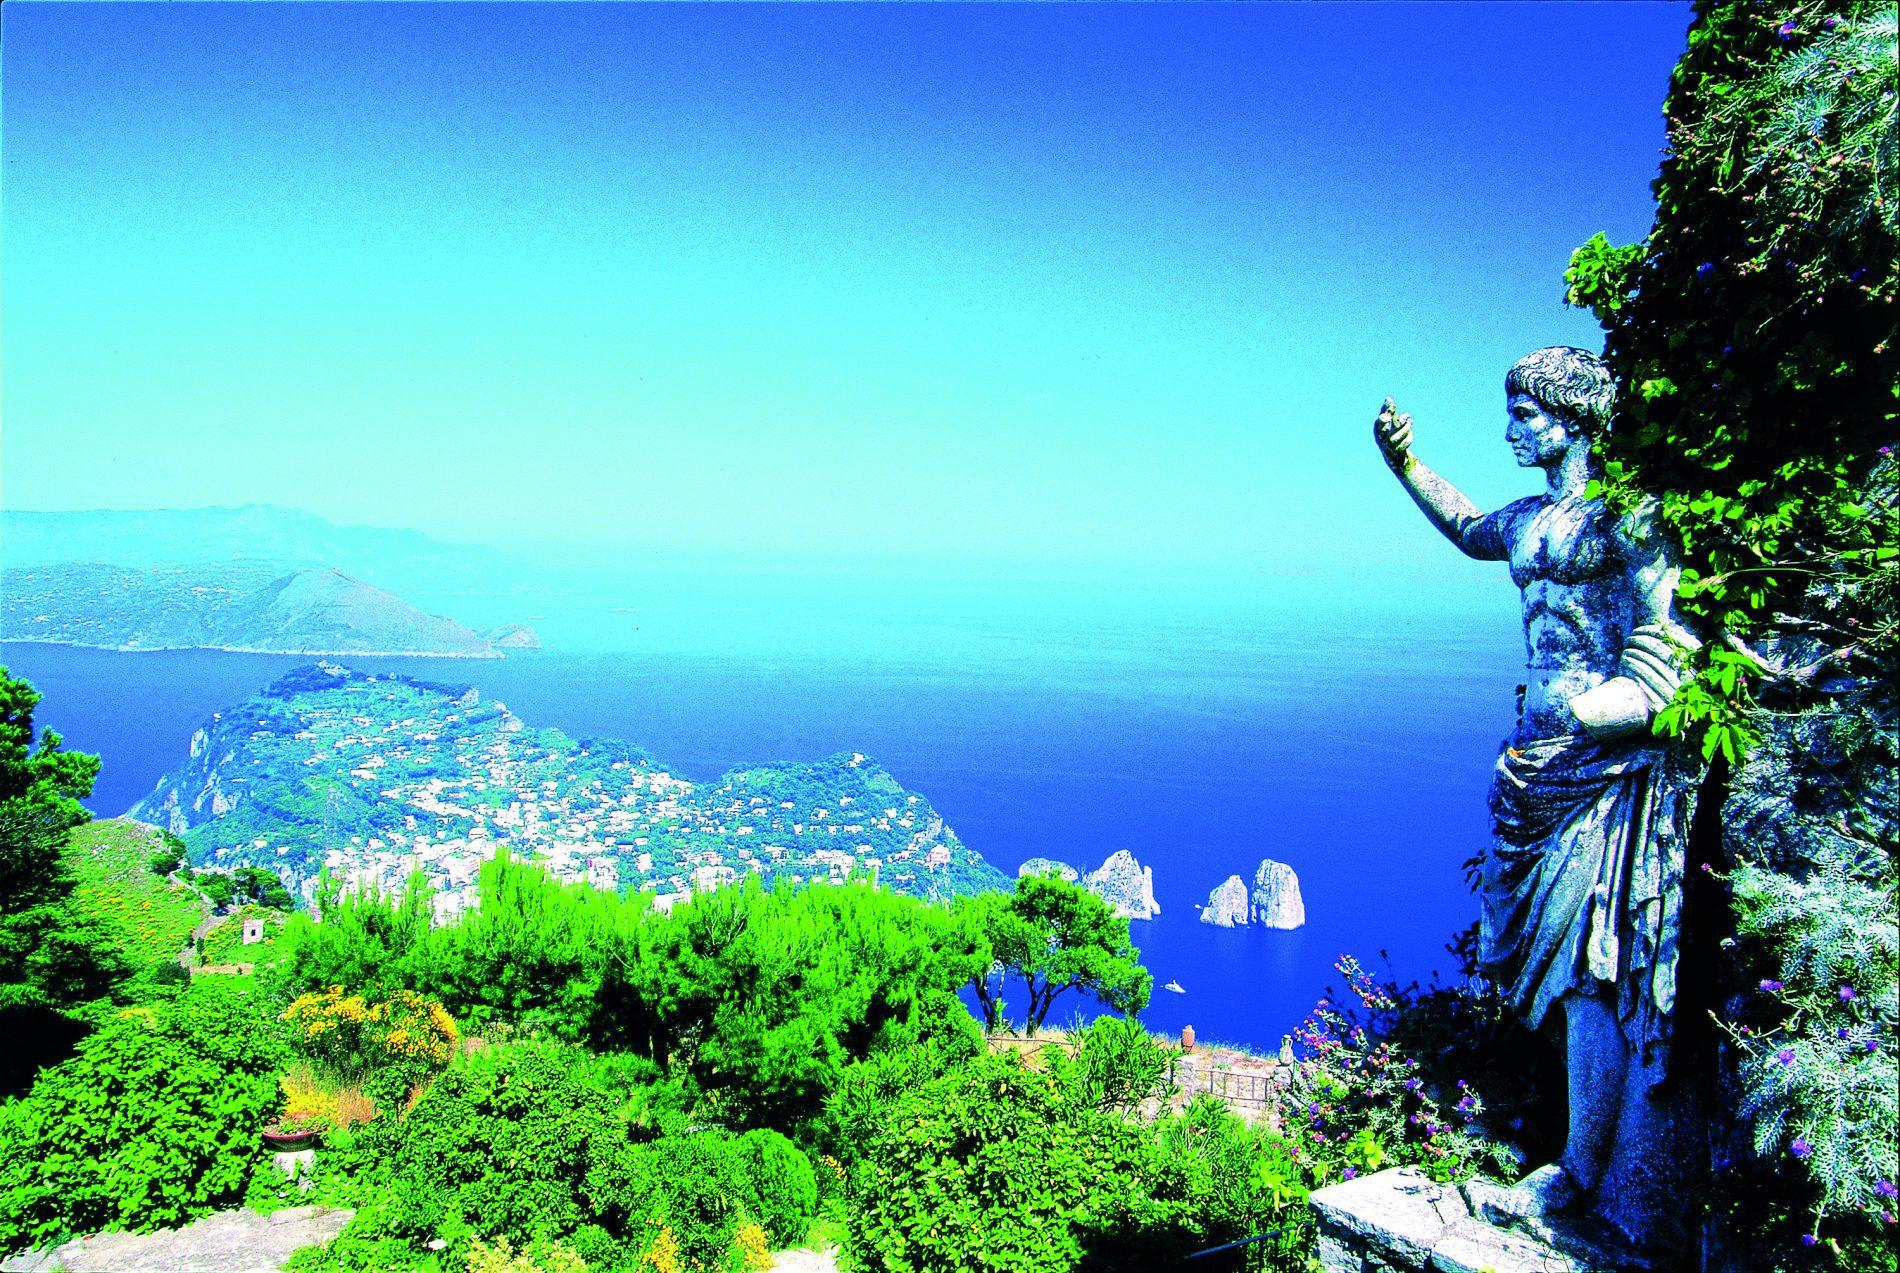 Statue of Emperor Augustus, Faraglioni rocks, Capri, Italy